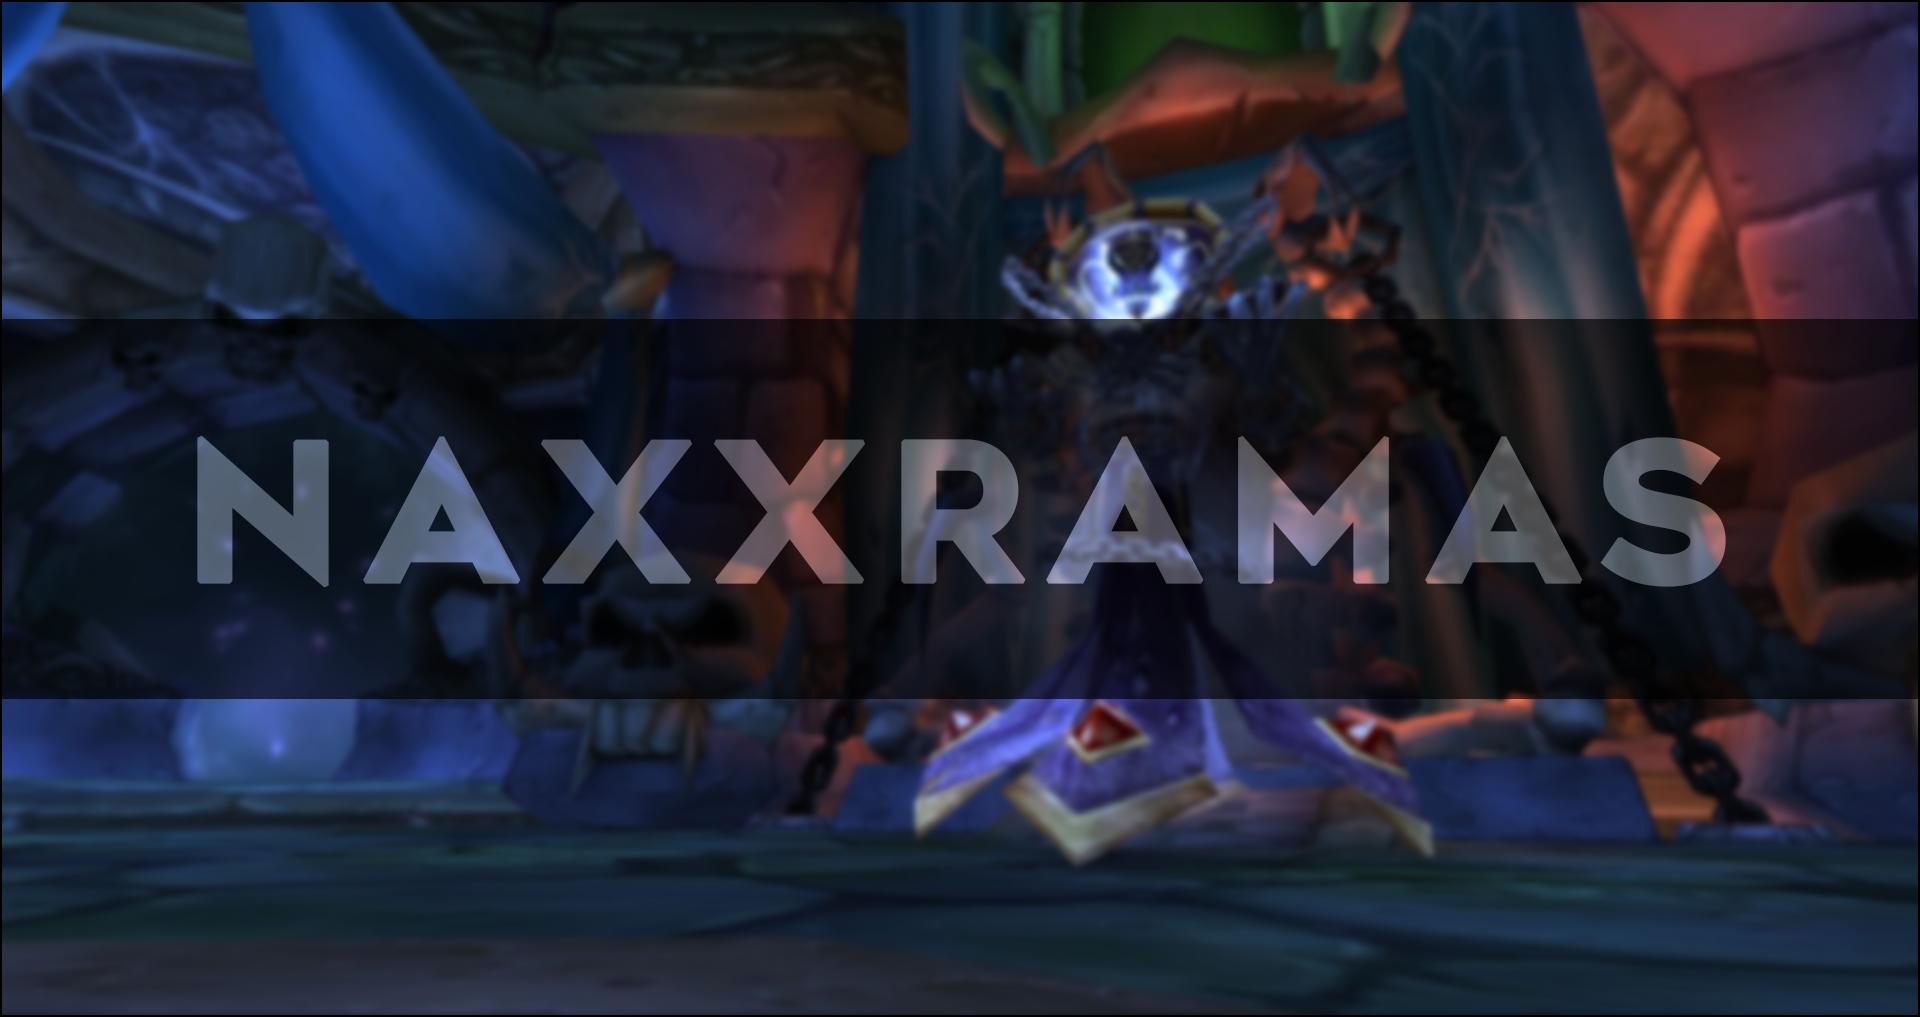 NAXXgraphic.png